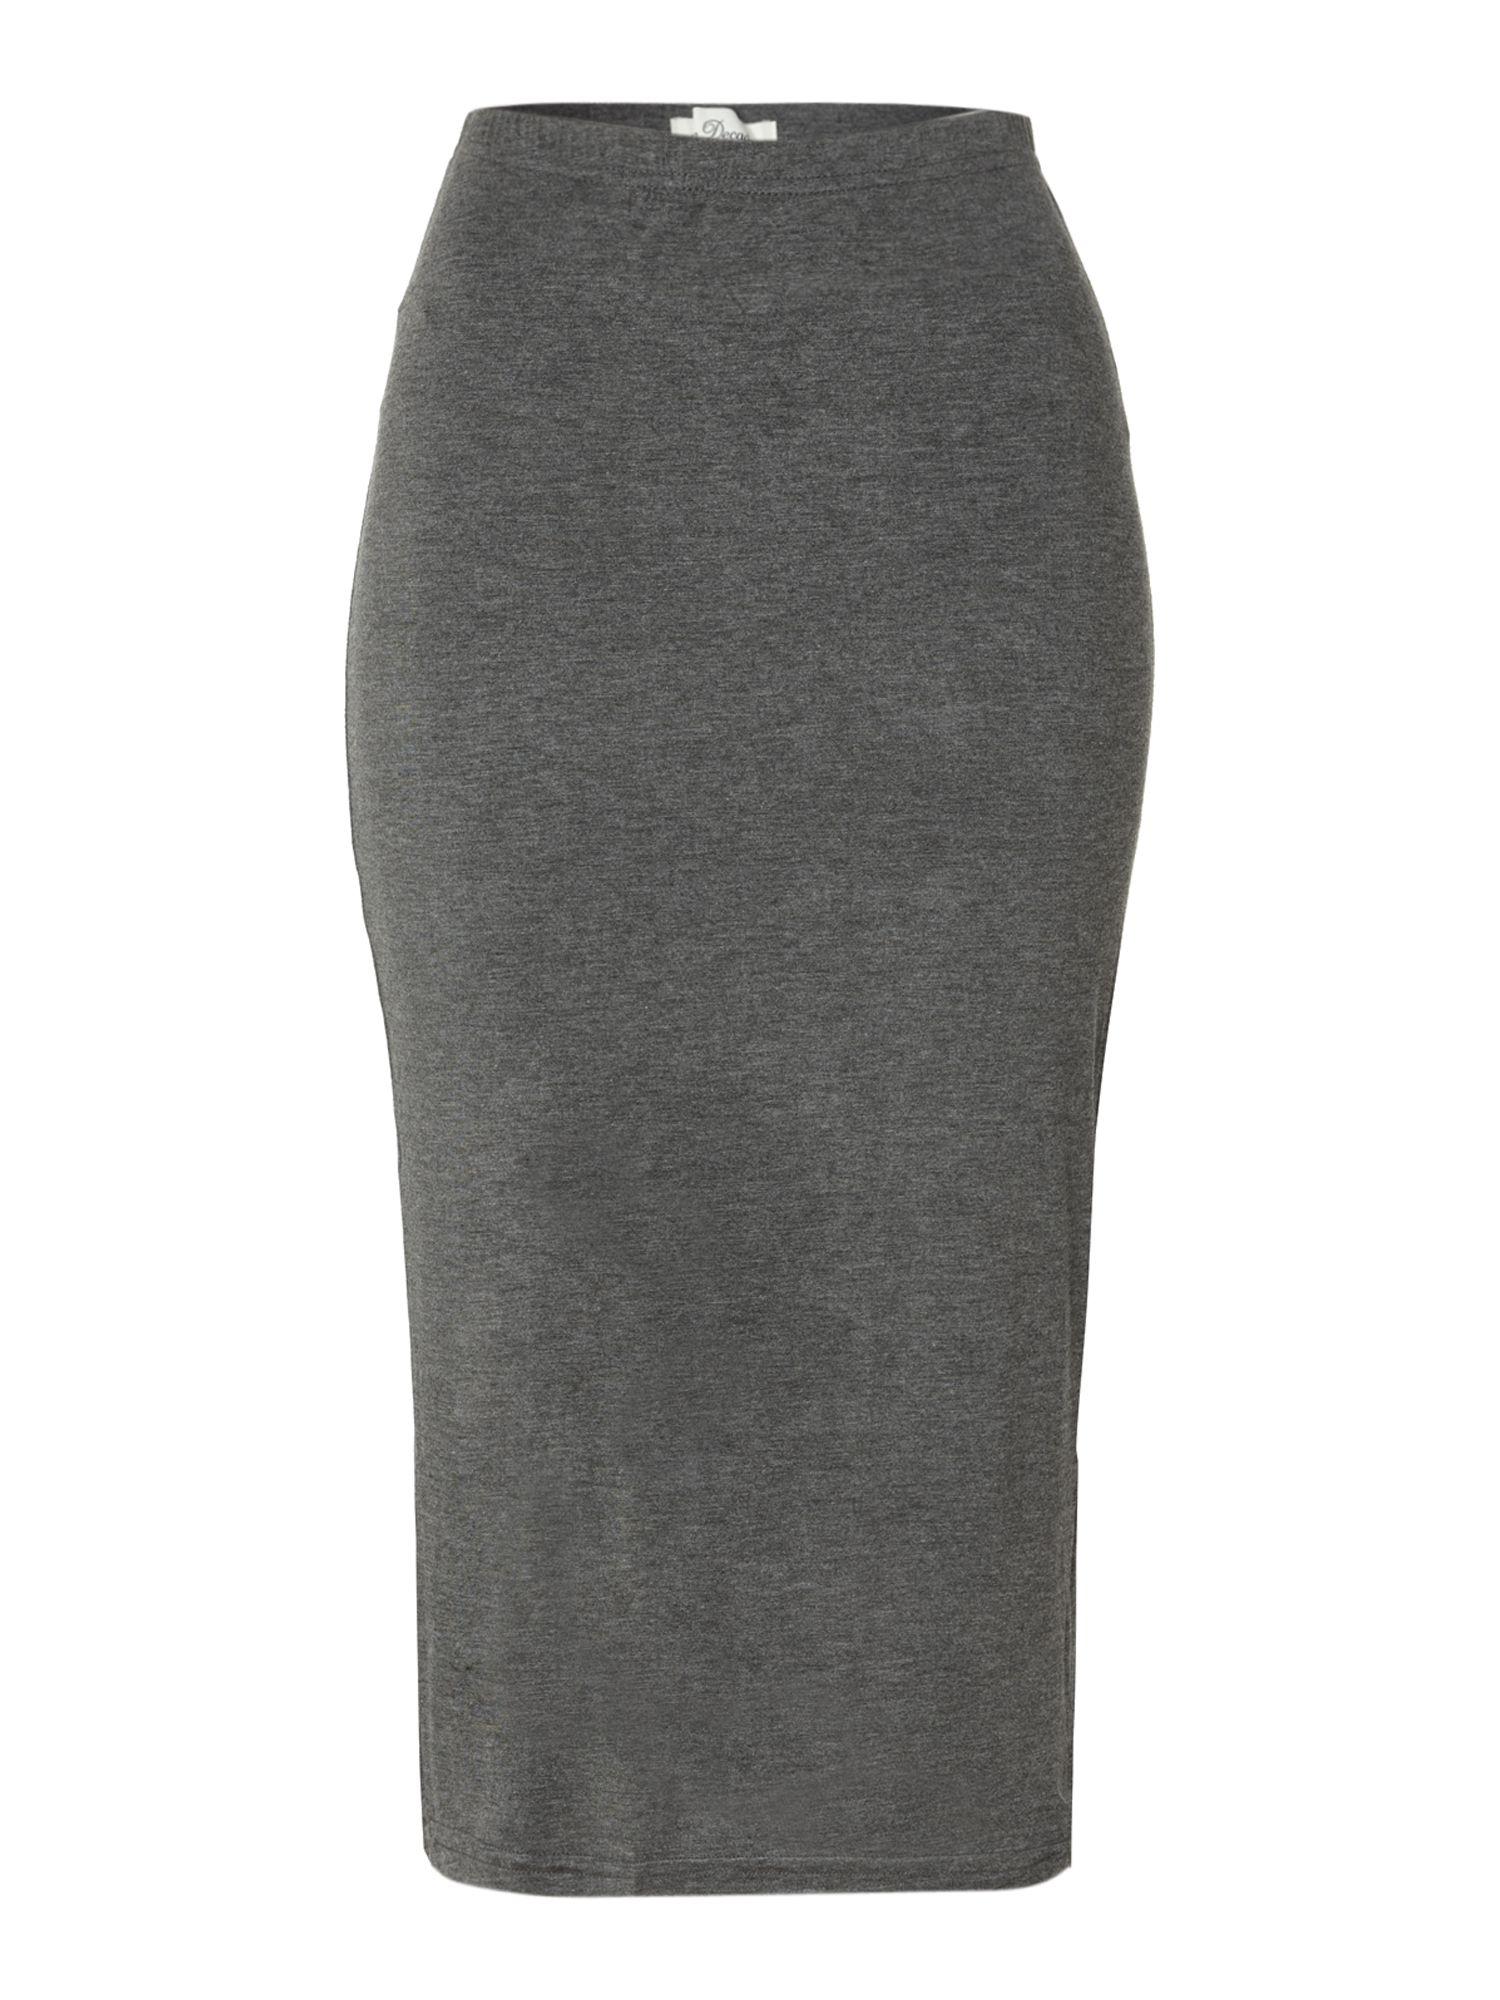 true decadence slim midi pencil skirt in gray charcoal